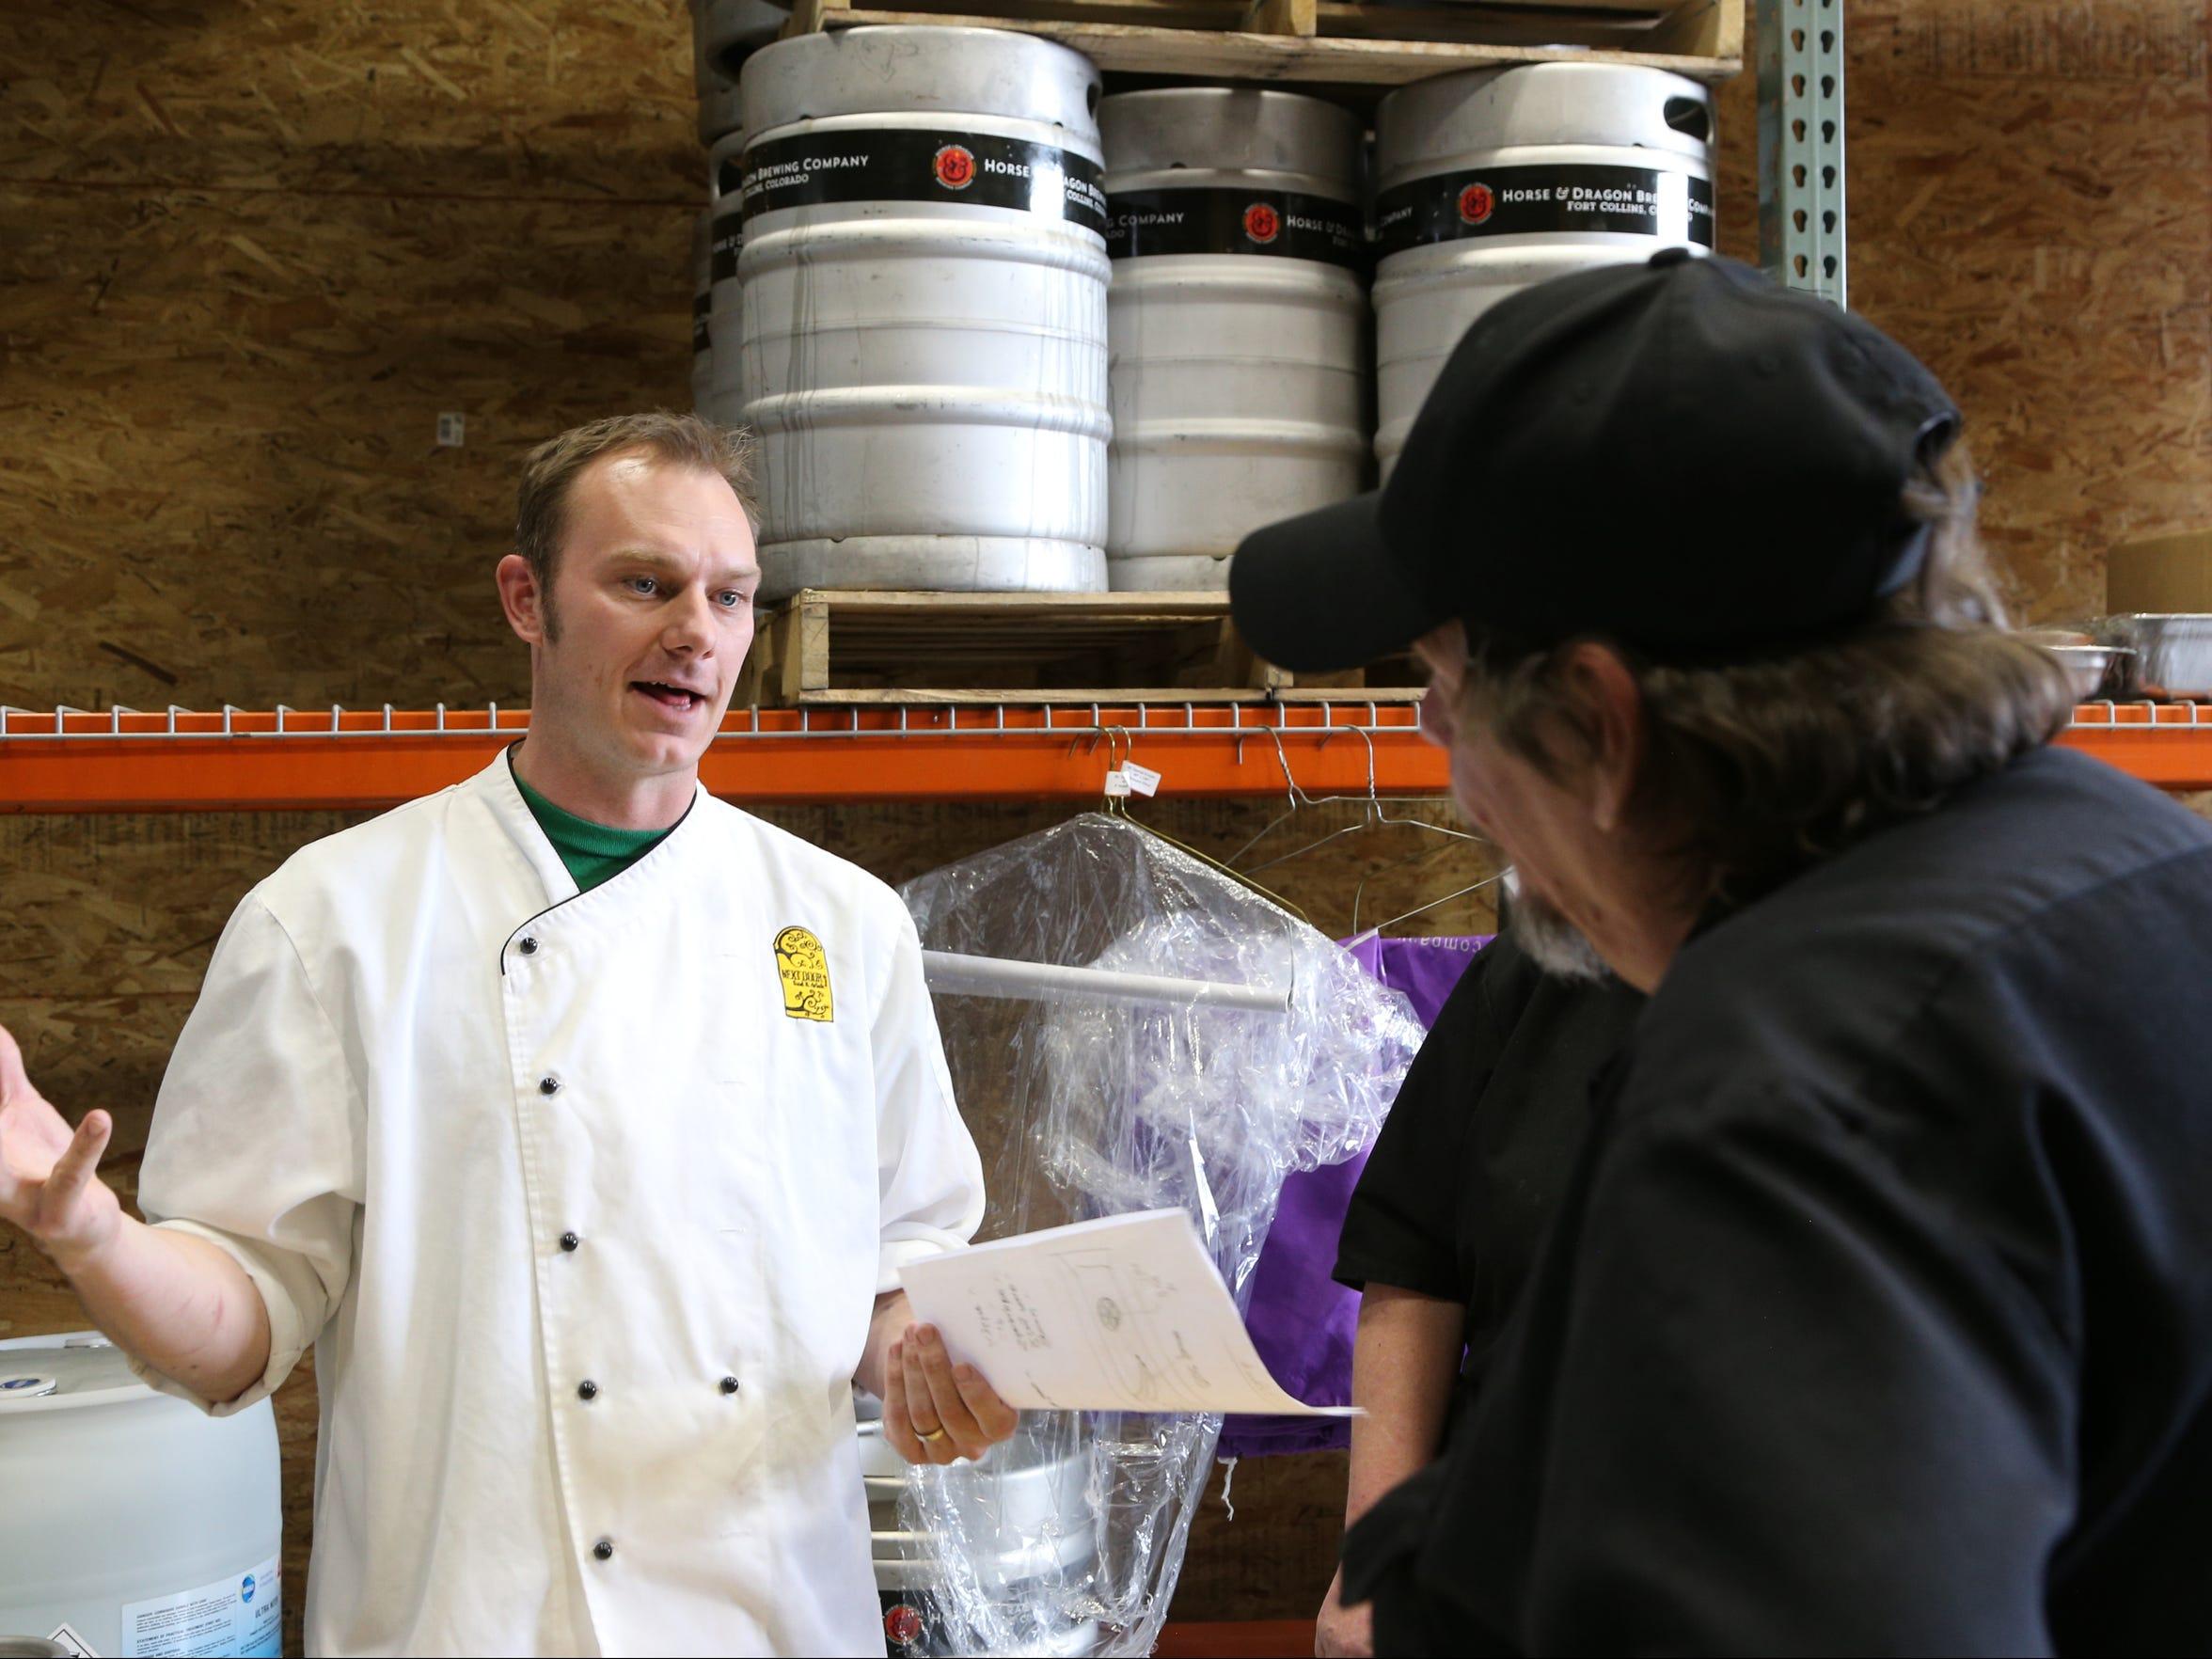 Matt Smith, executive chef at Next Door Food and Drink